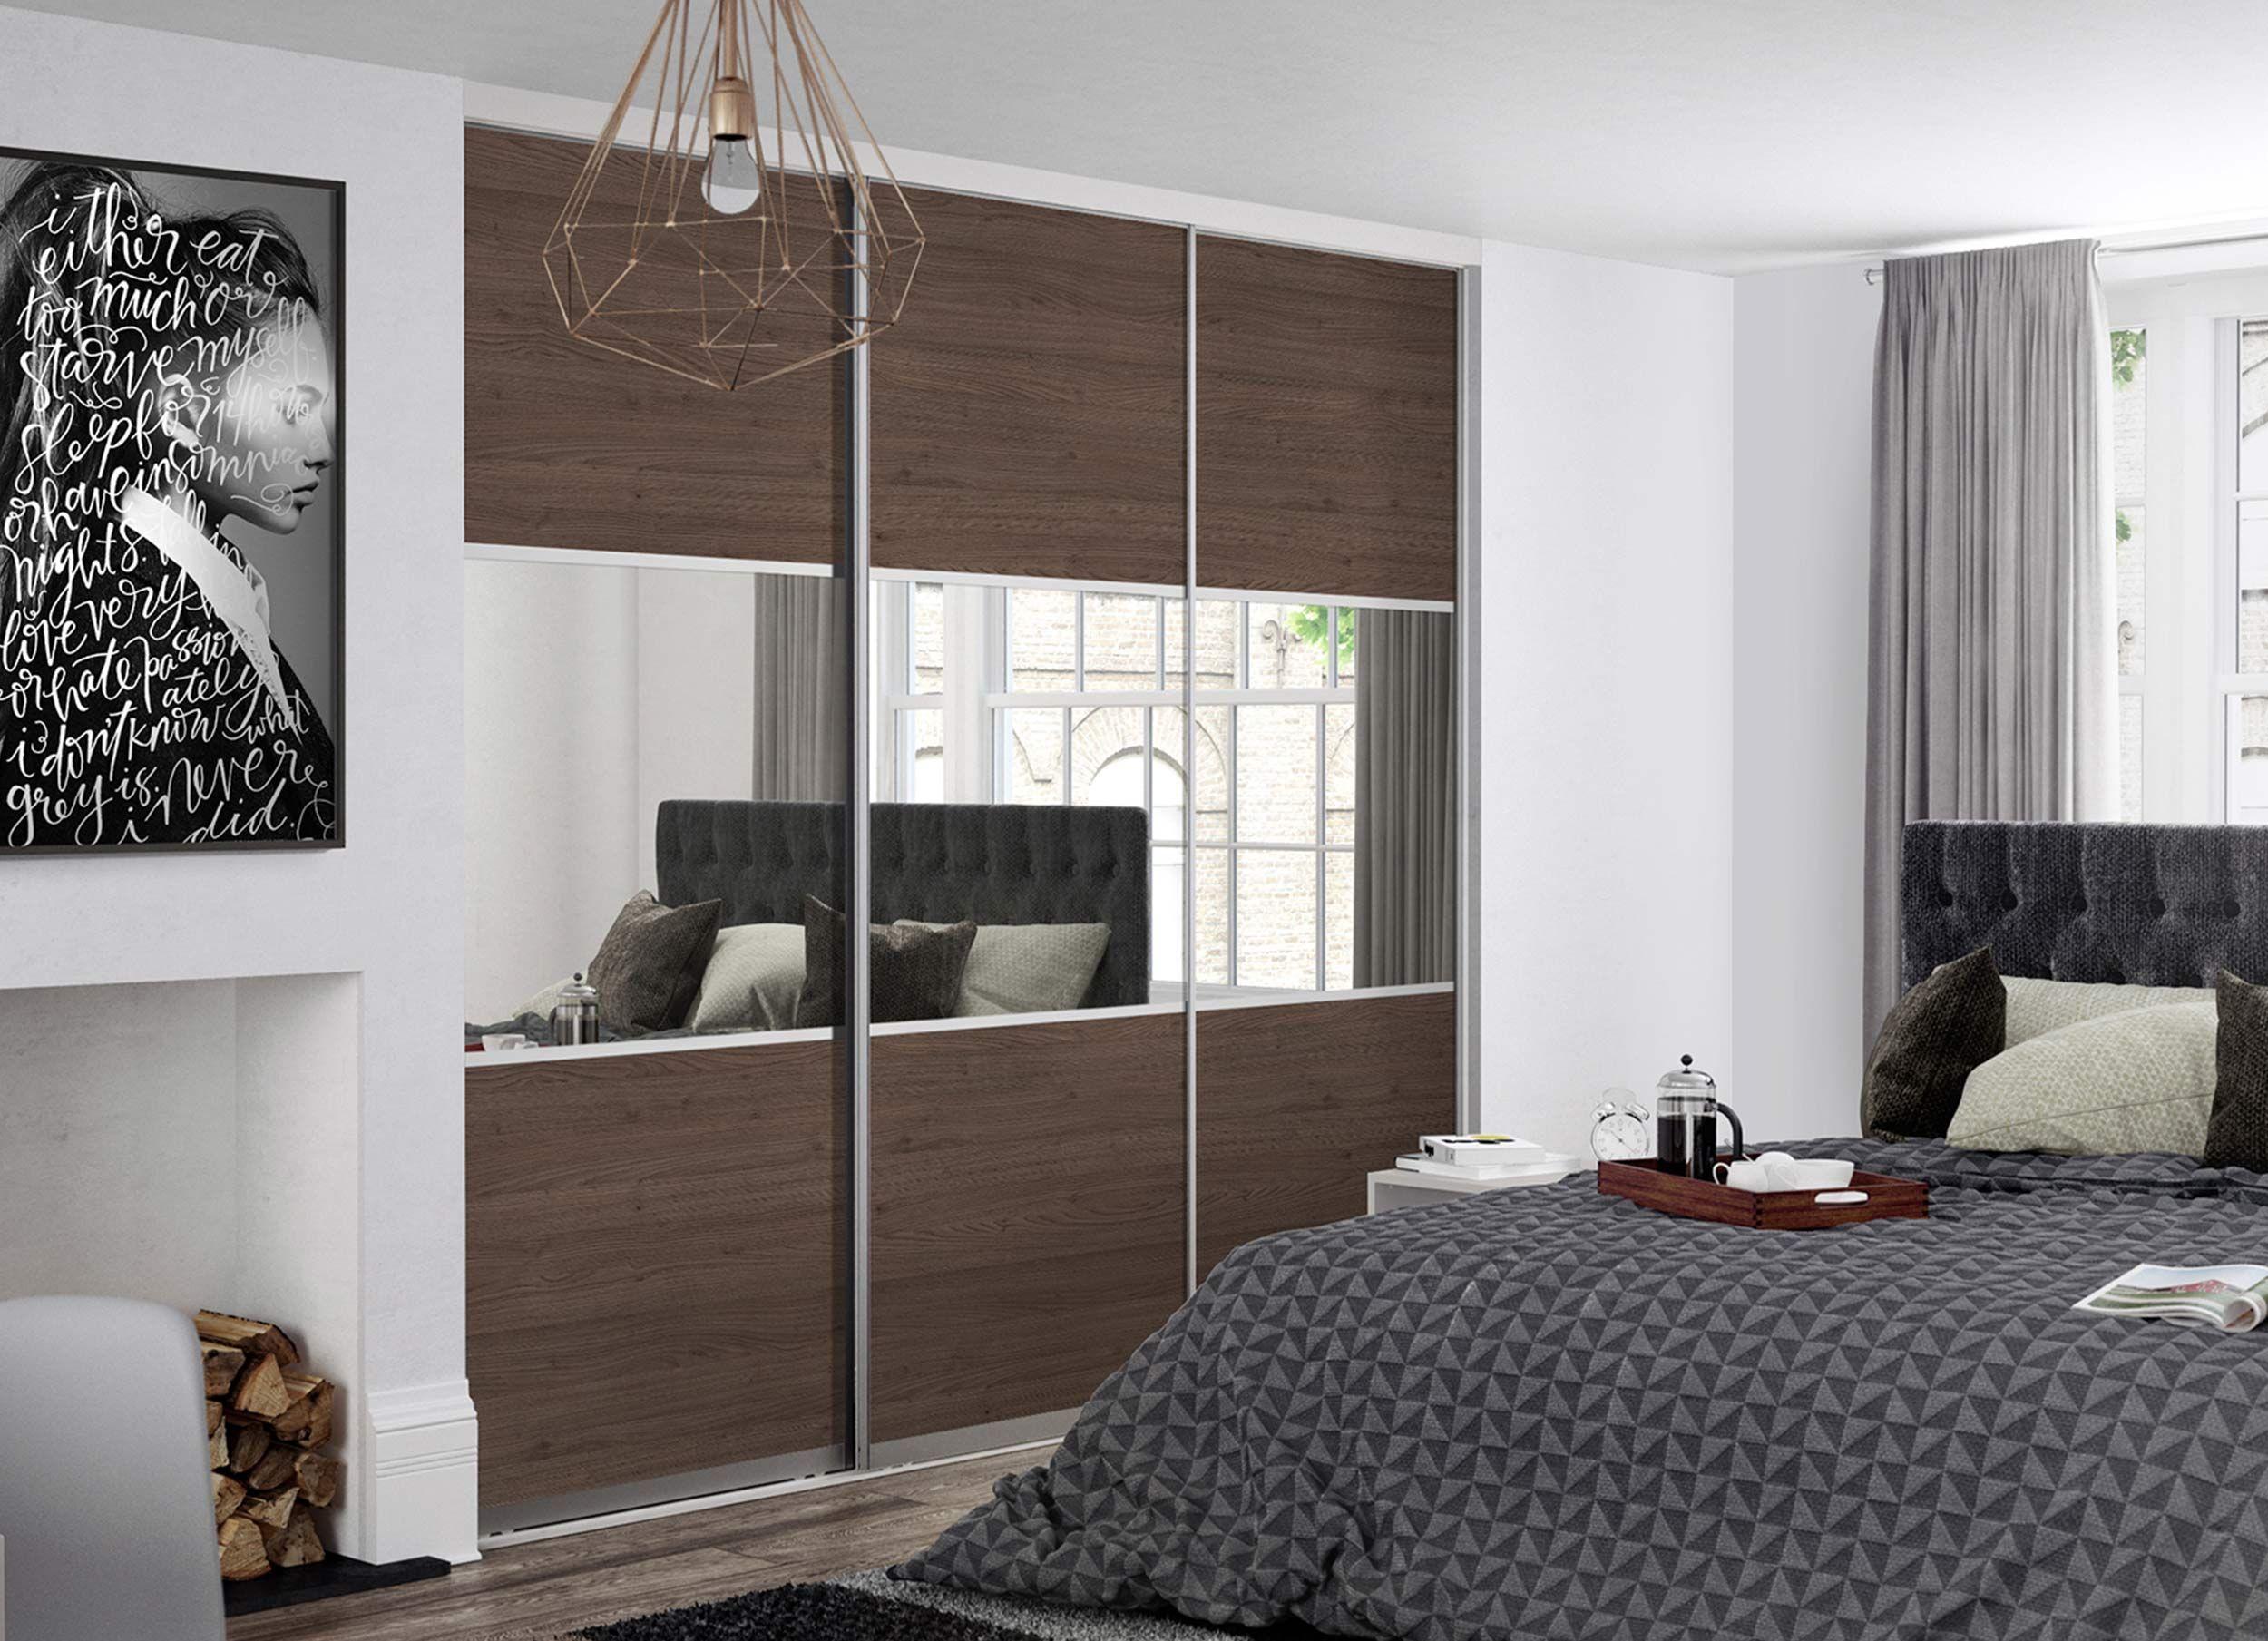 3 panel mirrored sliding closet doors - Premium Midi 3 Panel Tortona Chestnut Mirror Doors With Satin Silver Frame Sliding Wardrobe